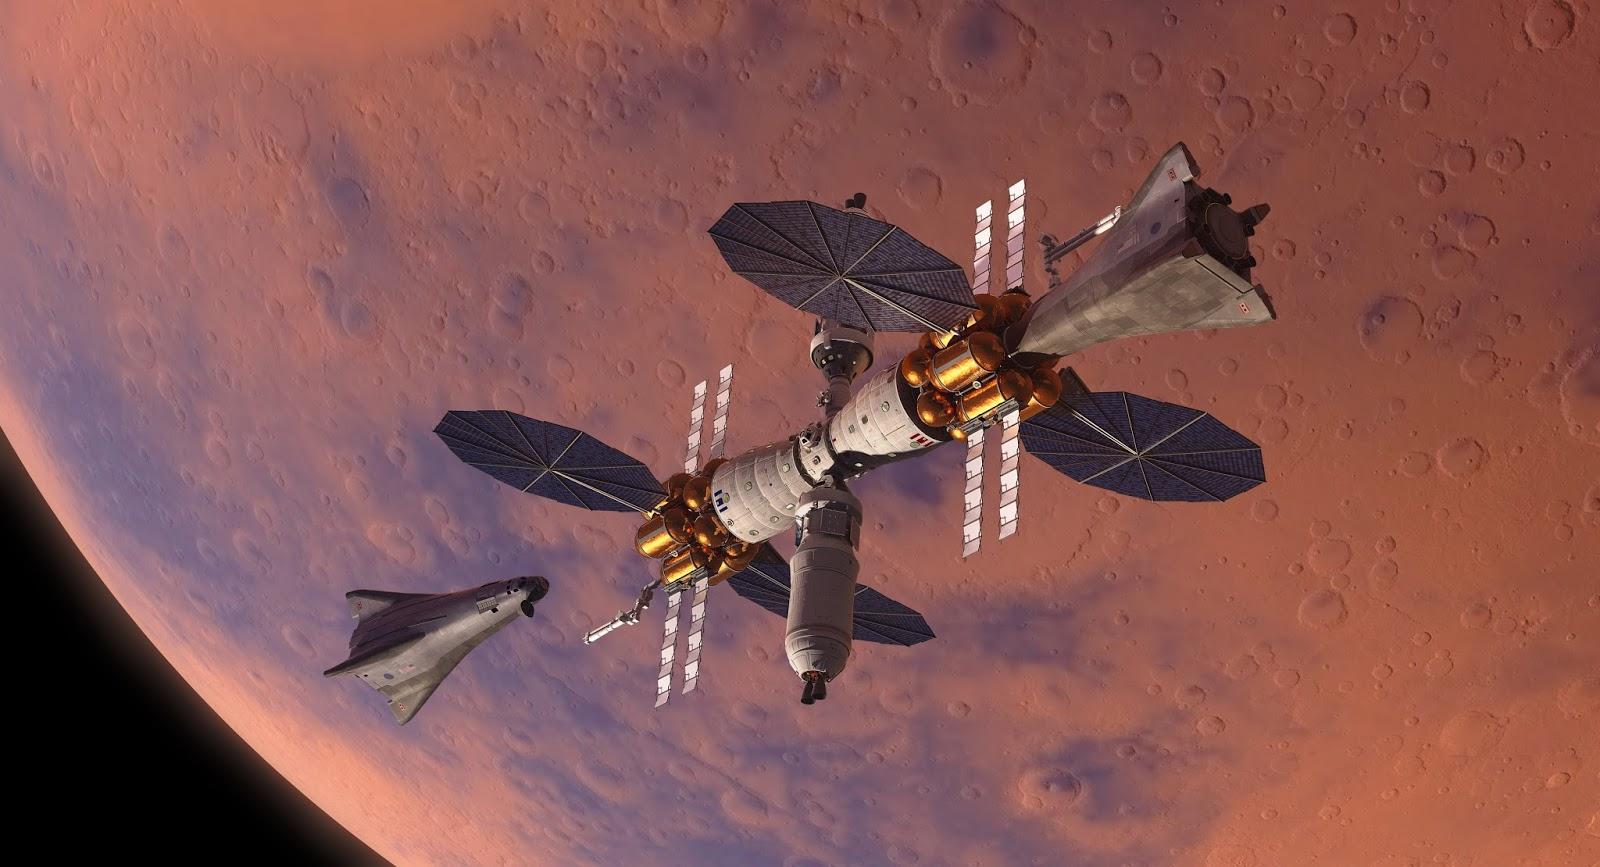 Lockheed Martin Mars lander docked with Mars Base Camp